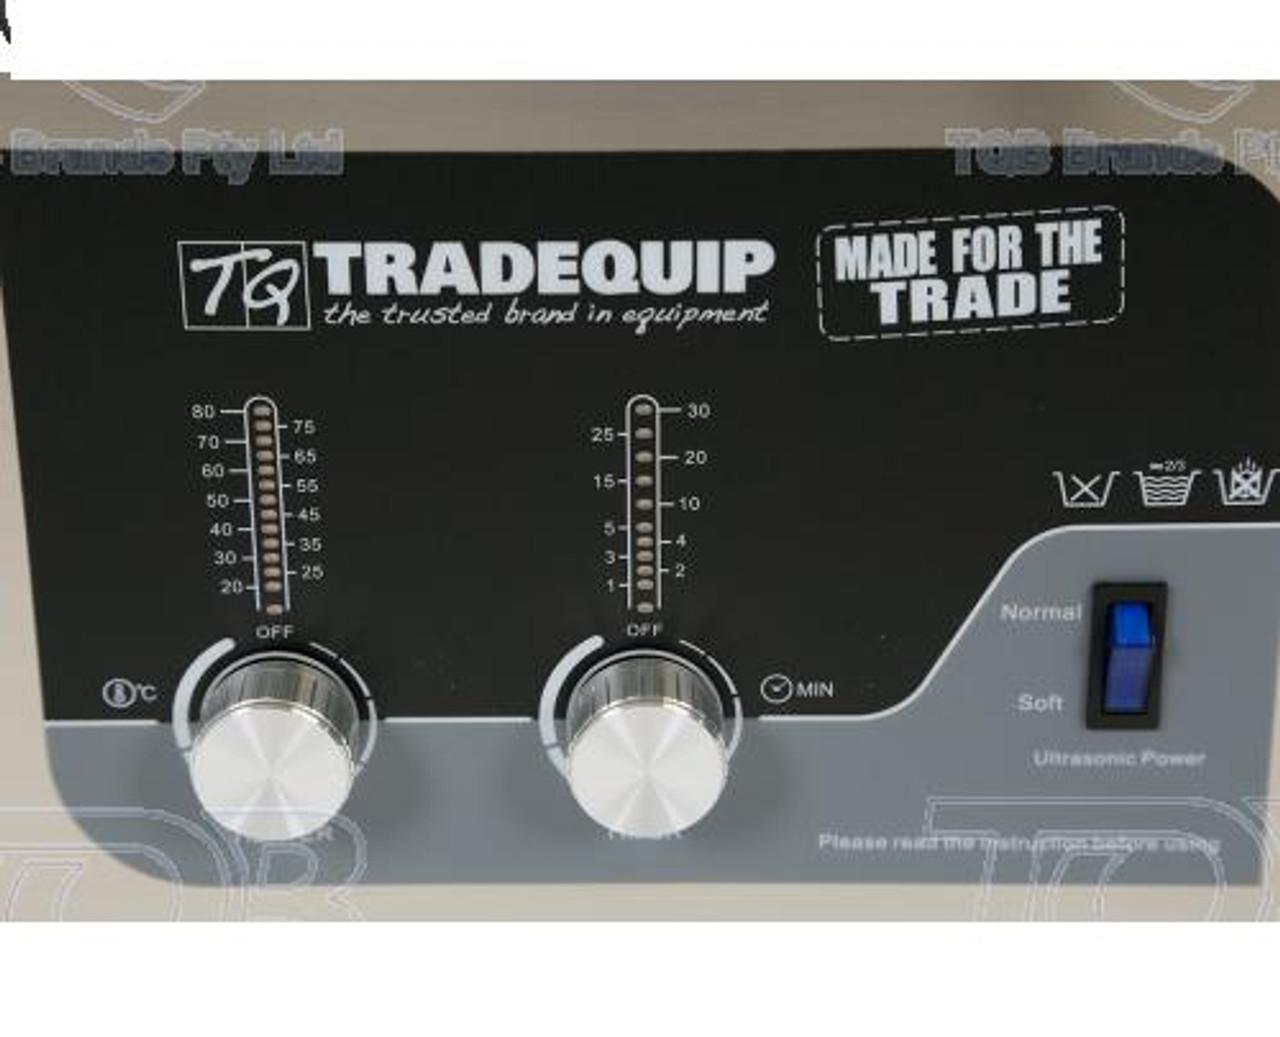 Ultrasonic Transducer Driver Circuitultrasonic Transducer Driver